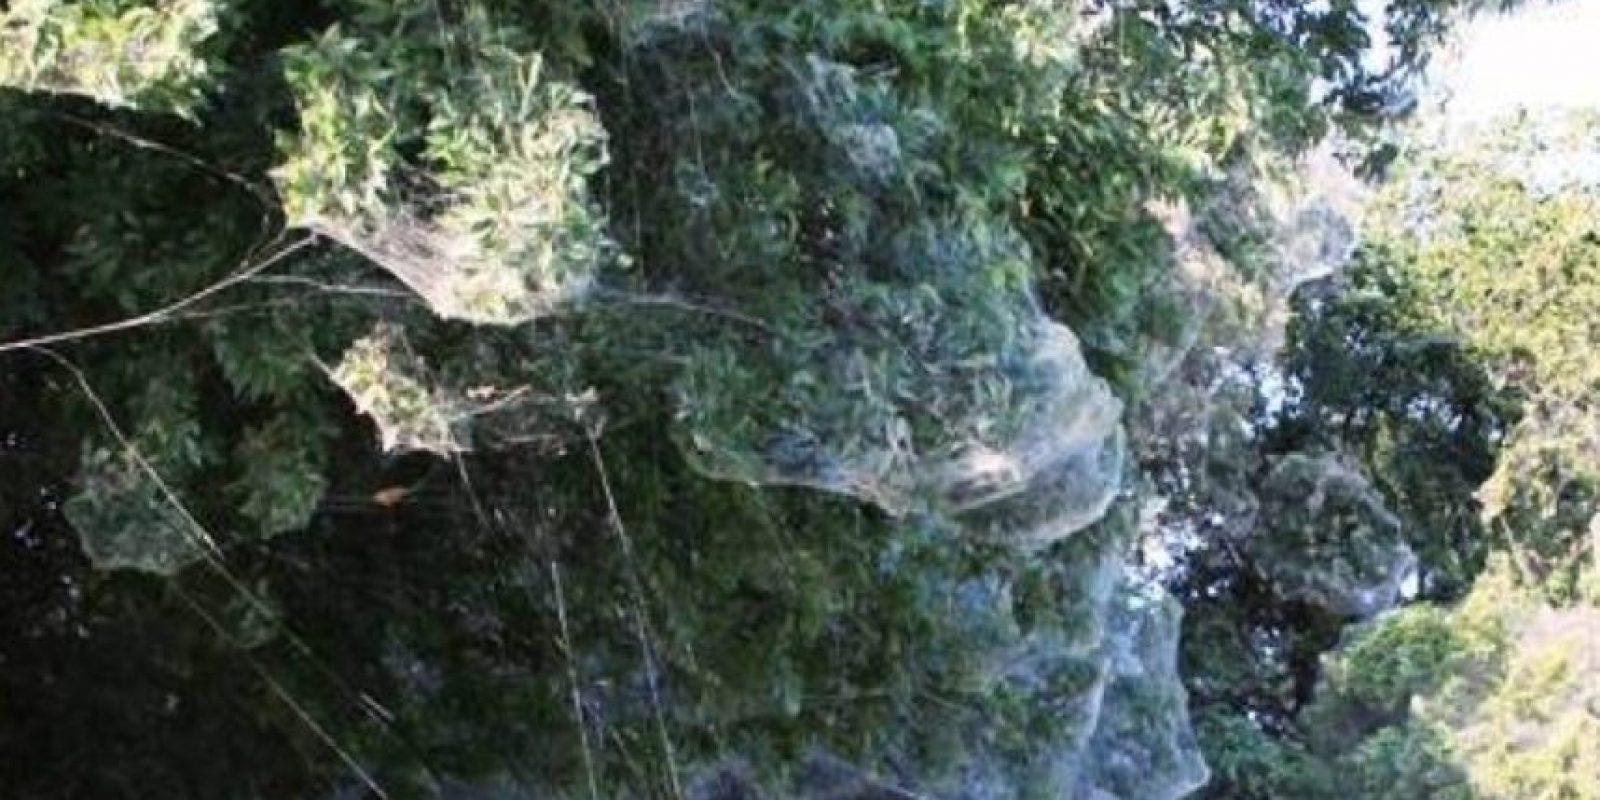 Cubre por completo los árboles. Foto: College of Agriculture and Life Sciences, Texas A&M AgriLife Extension Service